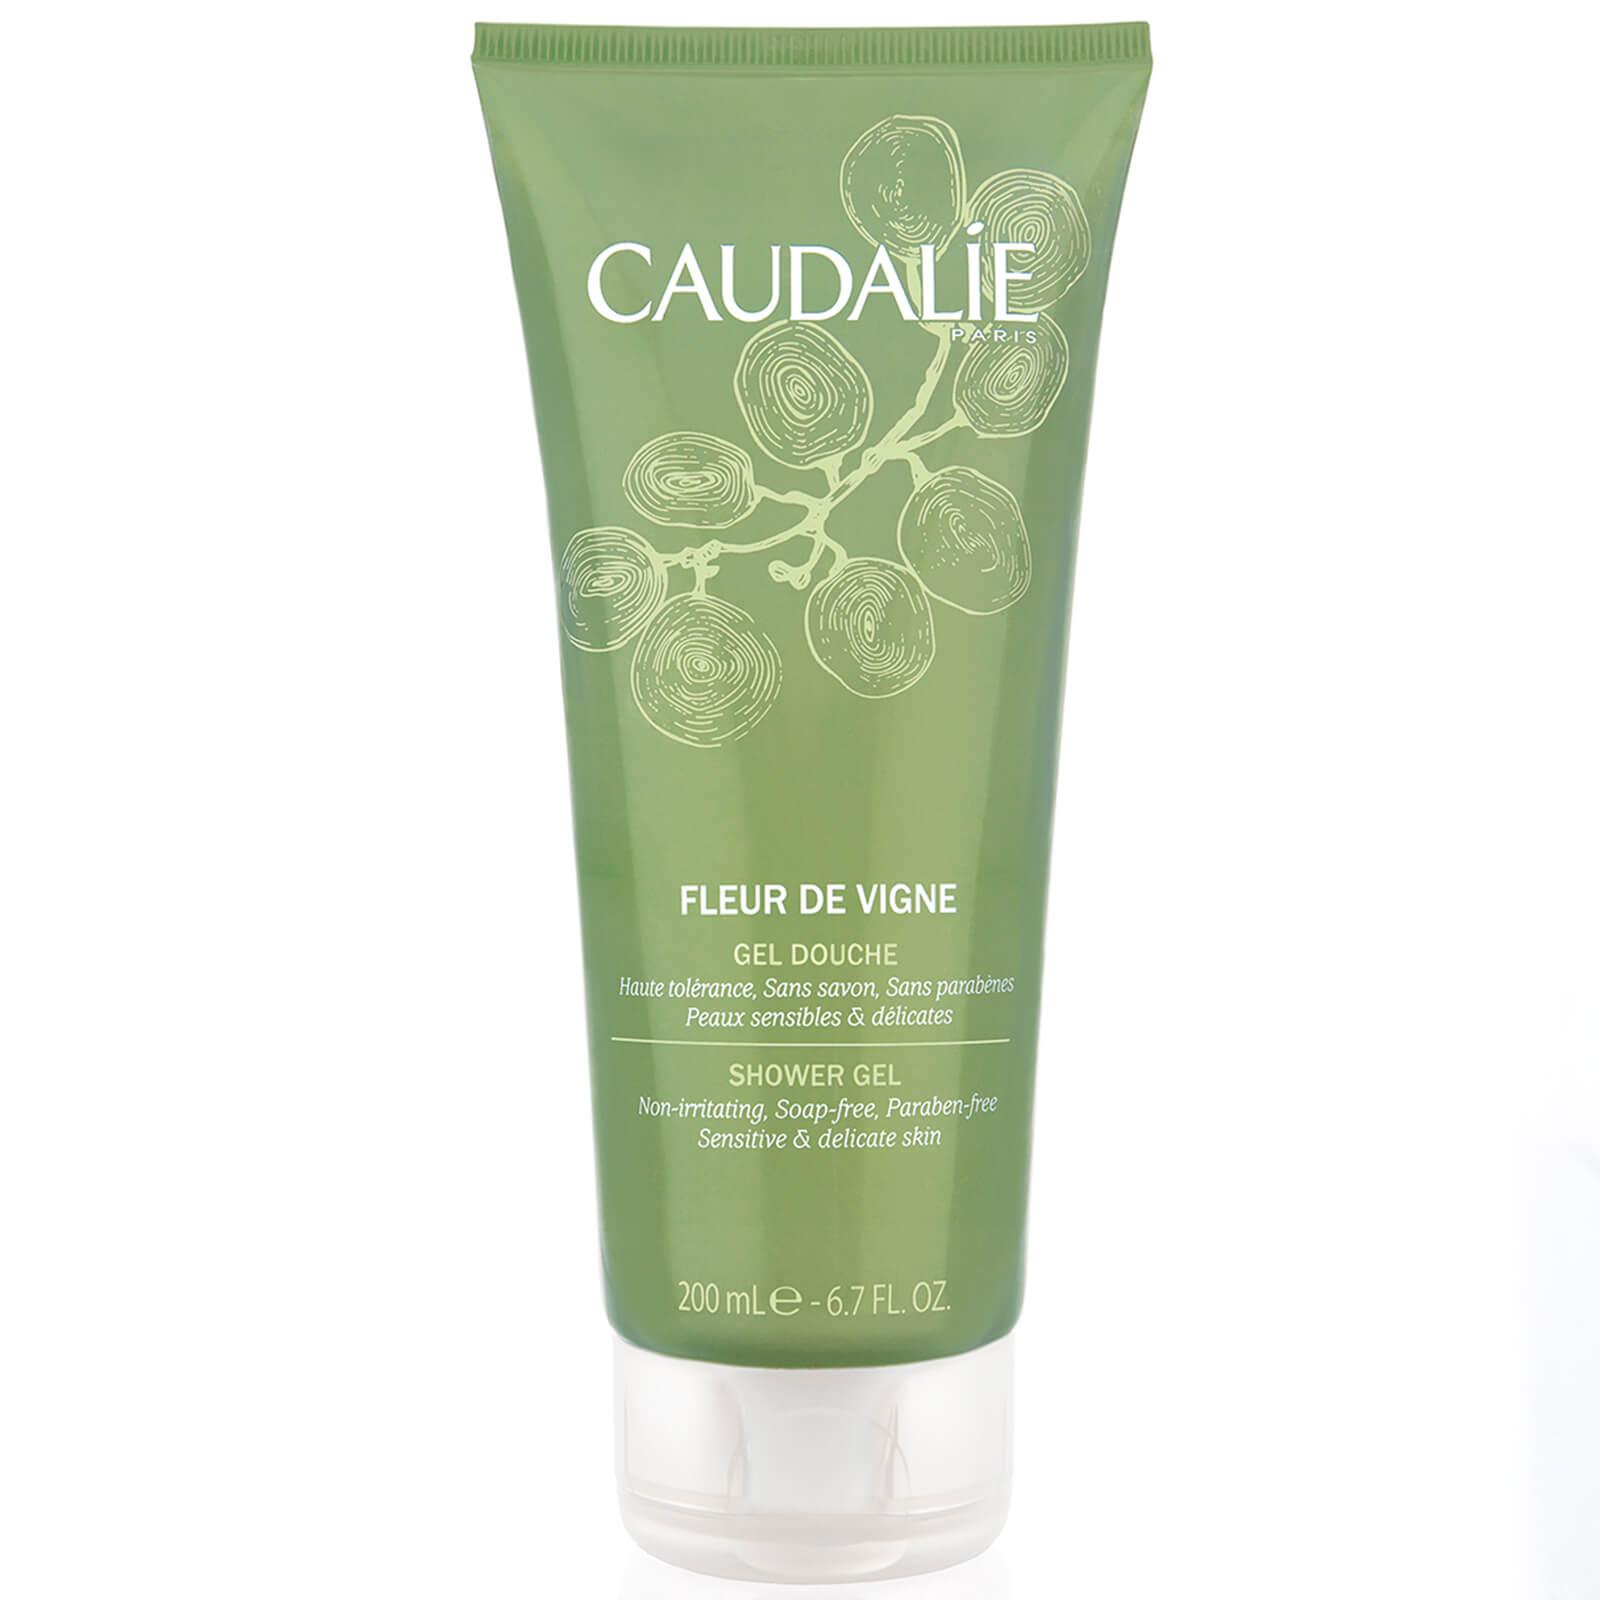 Caudalie Fleur De Vigne Shower Gel 200ml Free Shipping